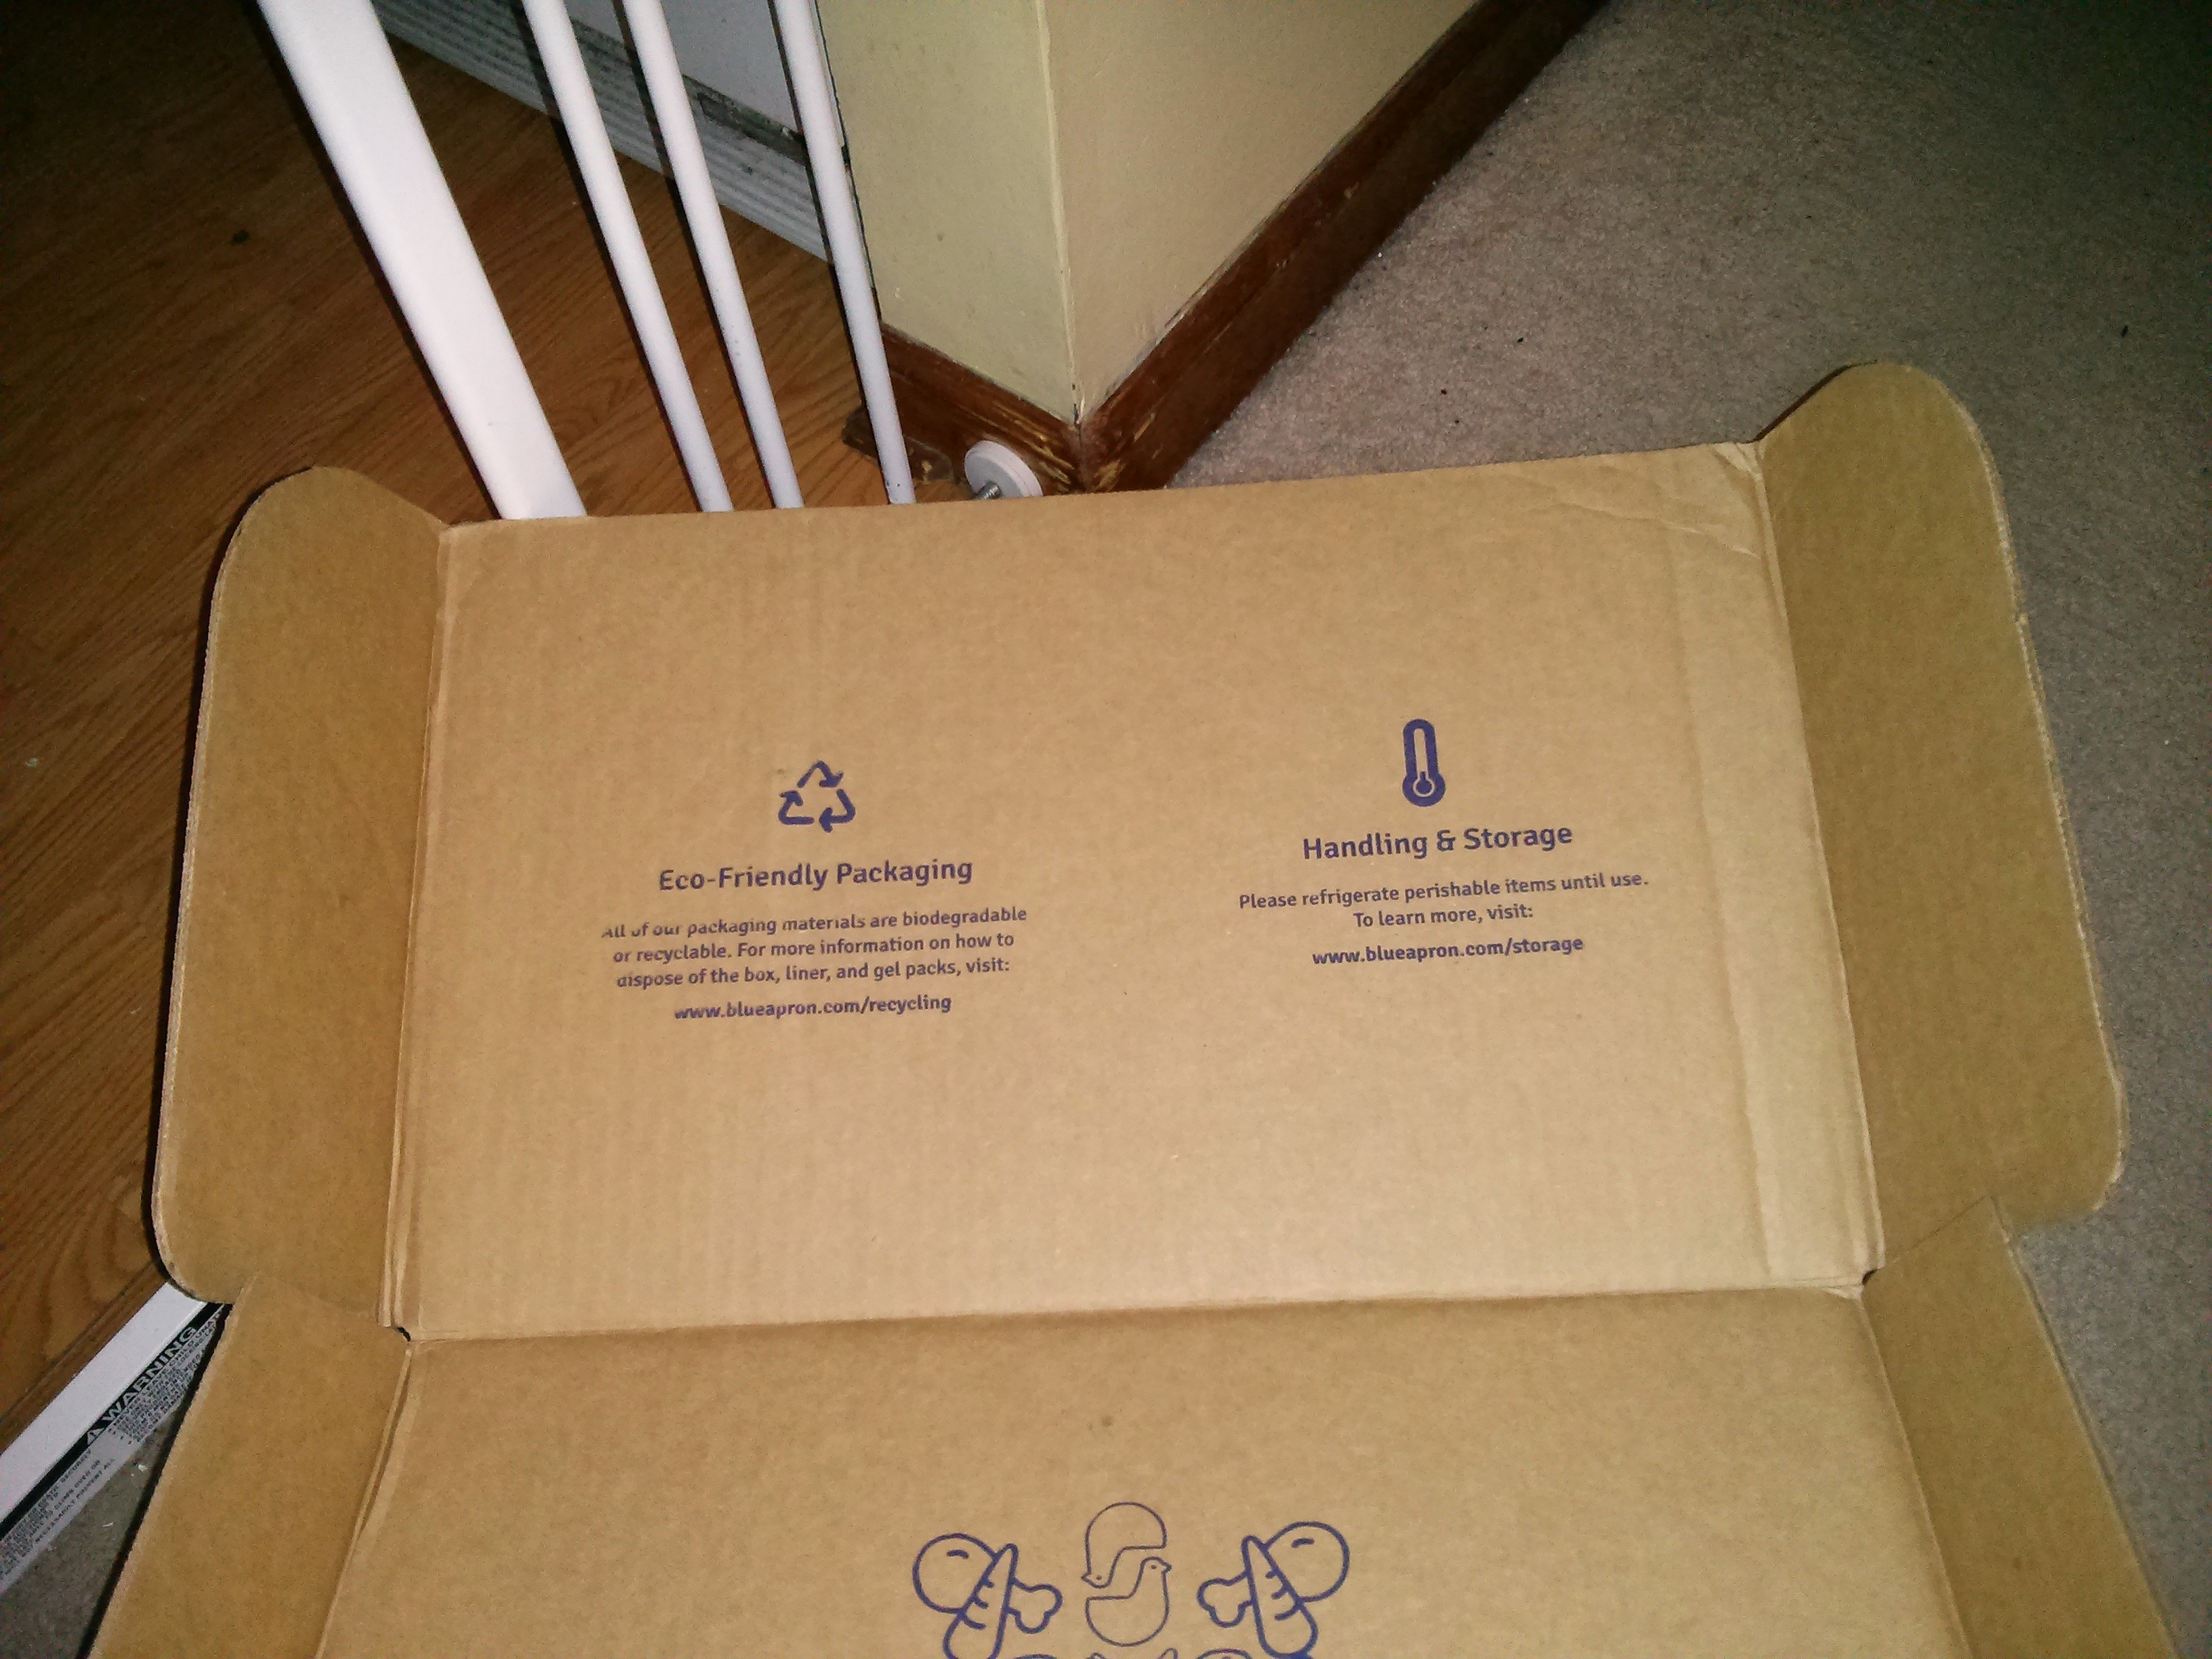 Blue apron packaging waste - Blue Apron Box